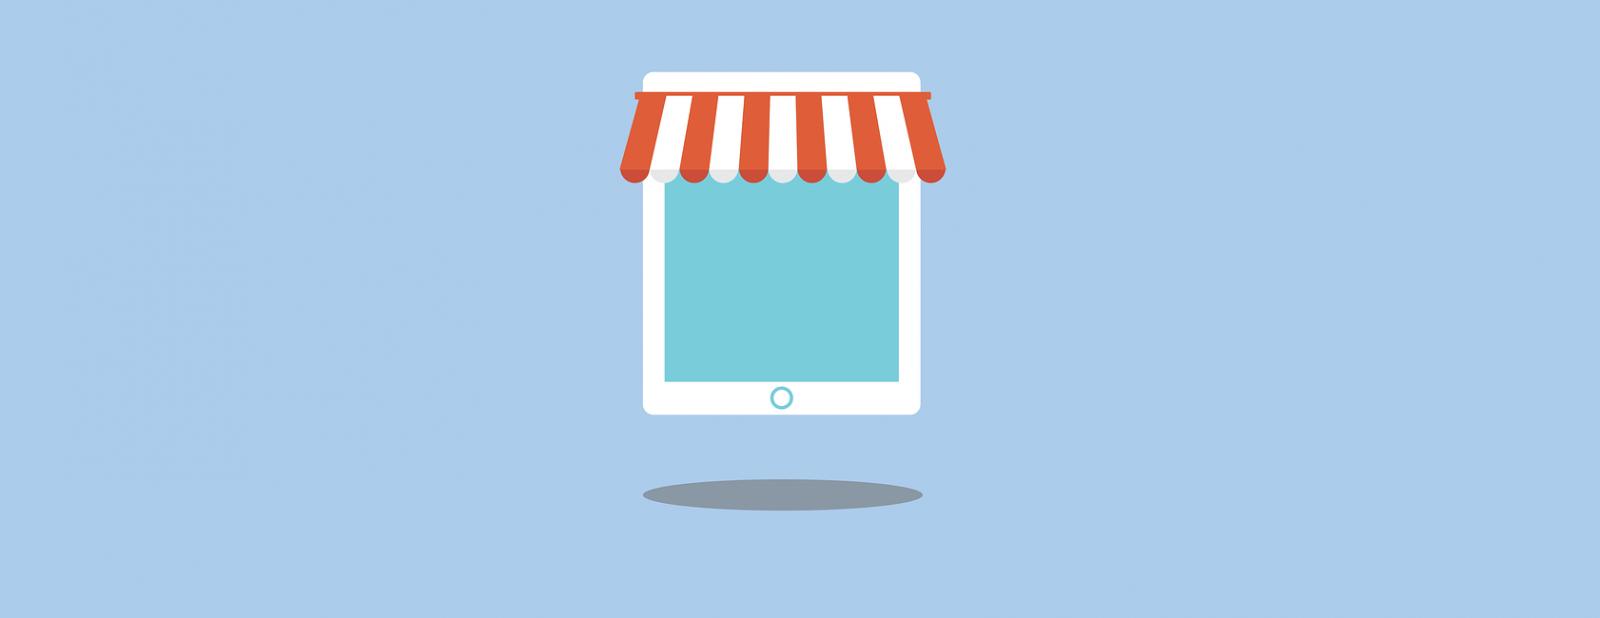 Social Media & E-commerce Business Enterprises